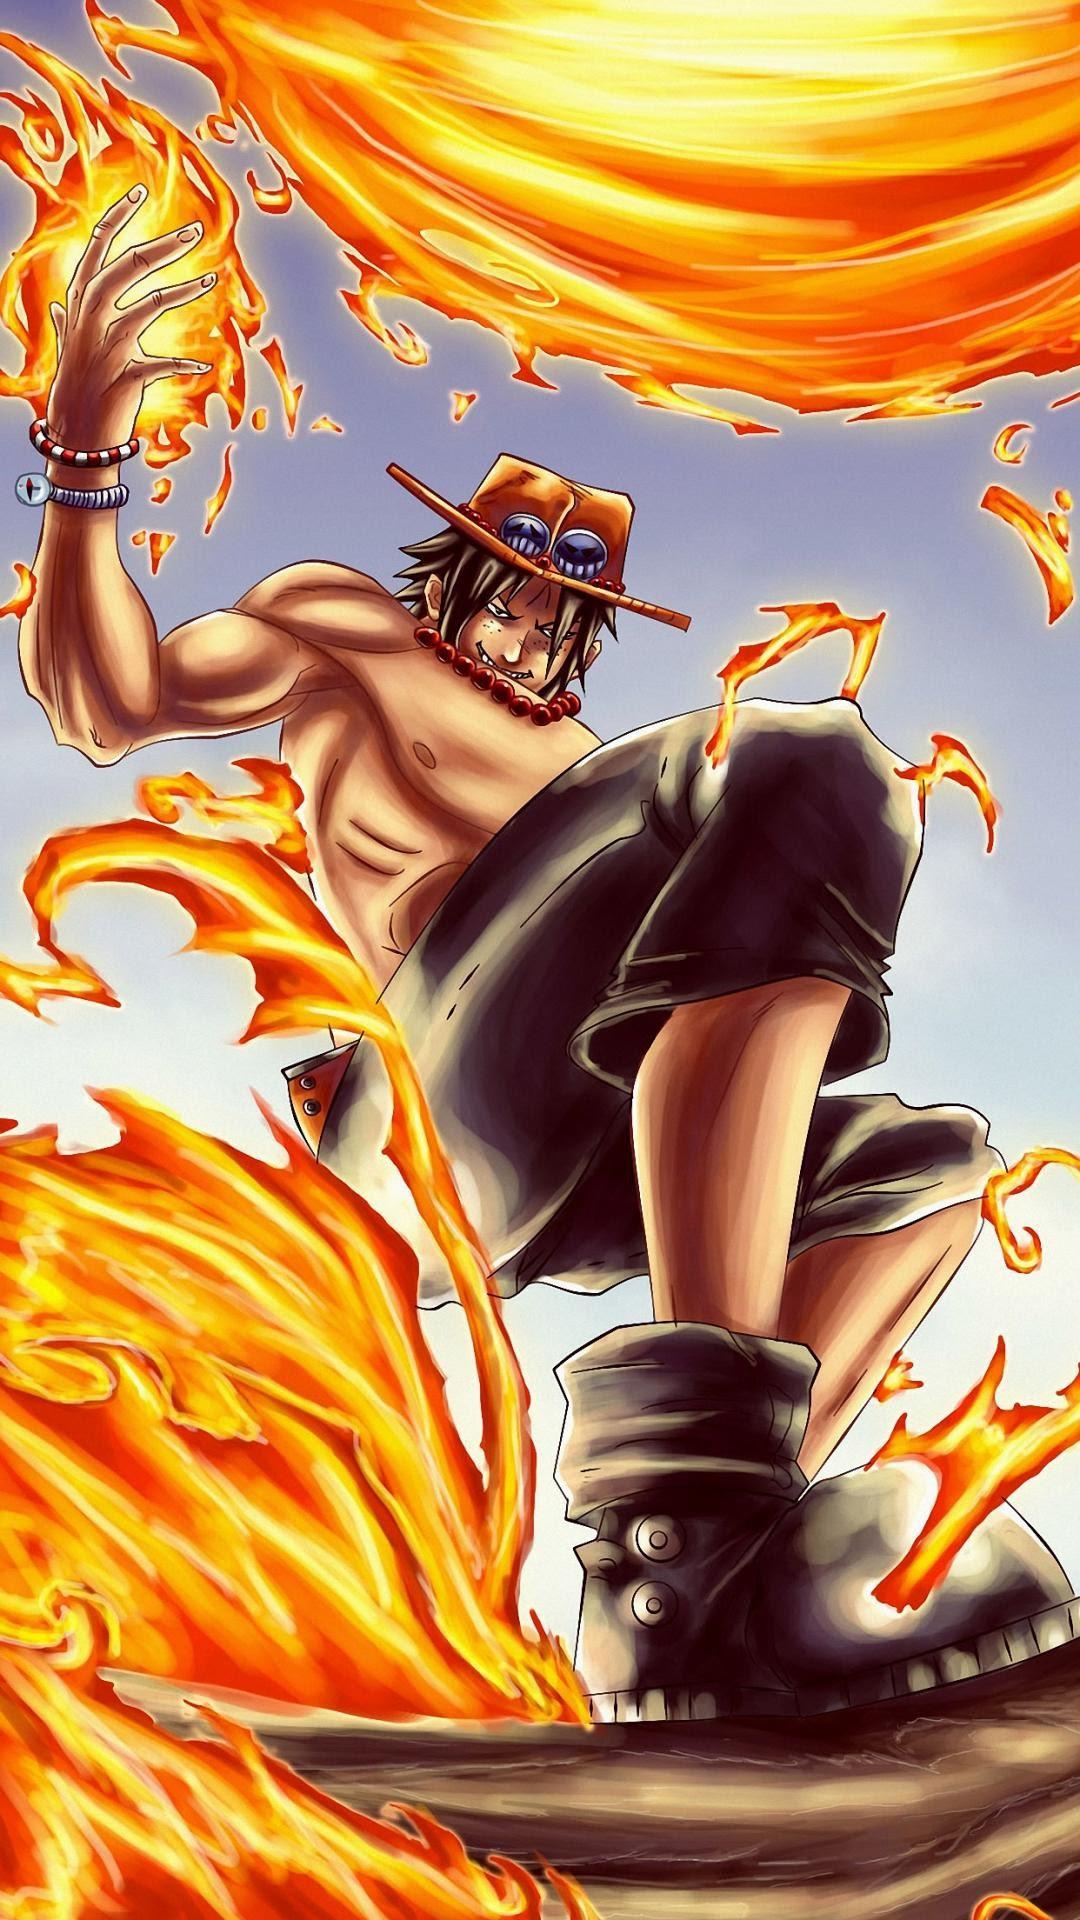 (9) Amazing One Piece Workart Wallpaper iPhone Terbaru